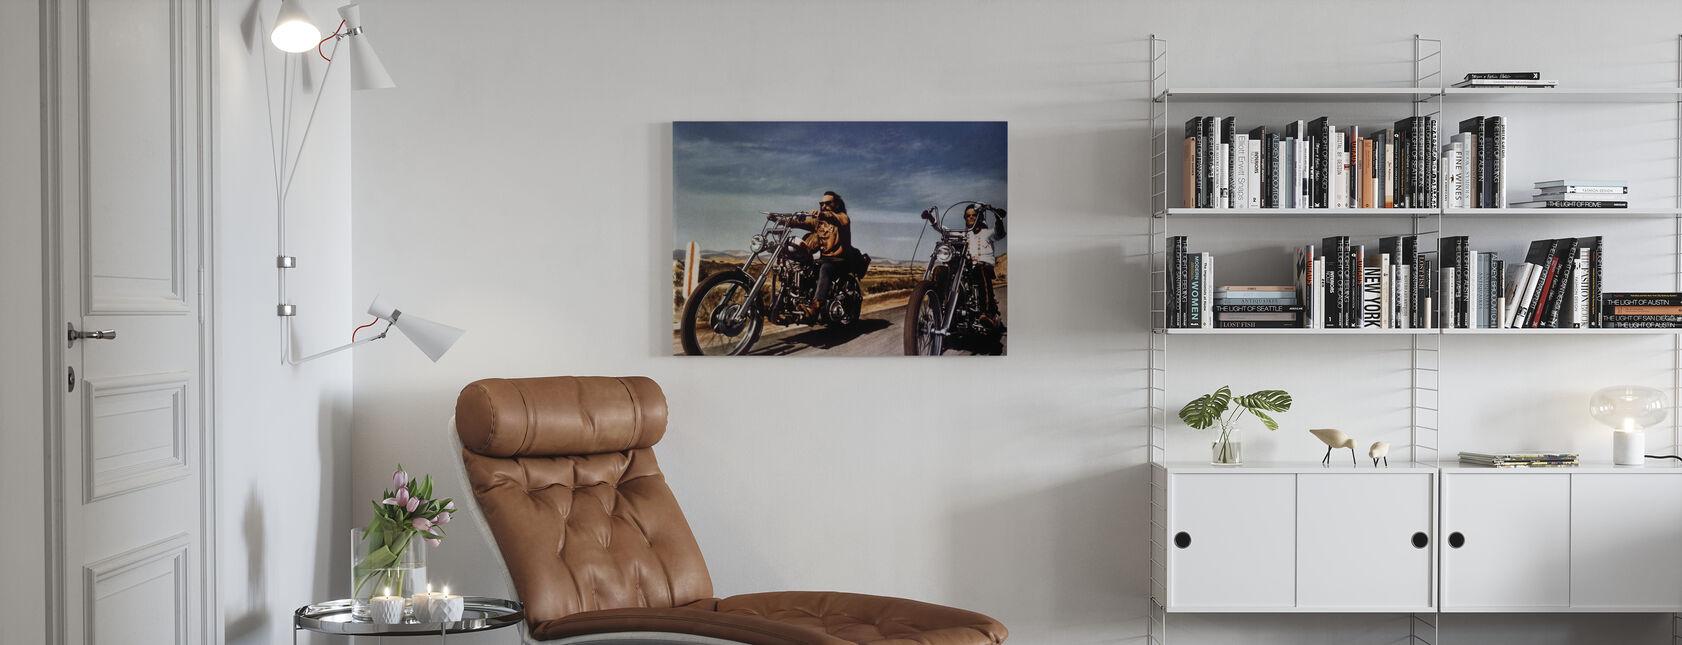 Dennis Hopper ja Peter Fonda Easy Rider - Canvastaulu - Olohuone